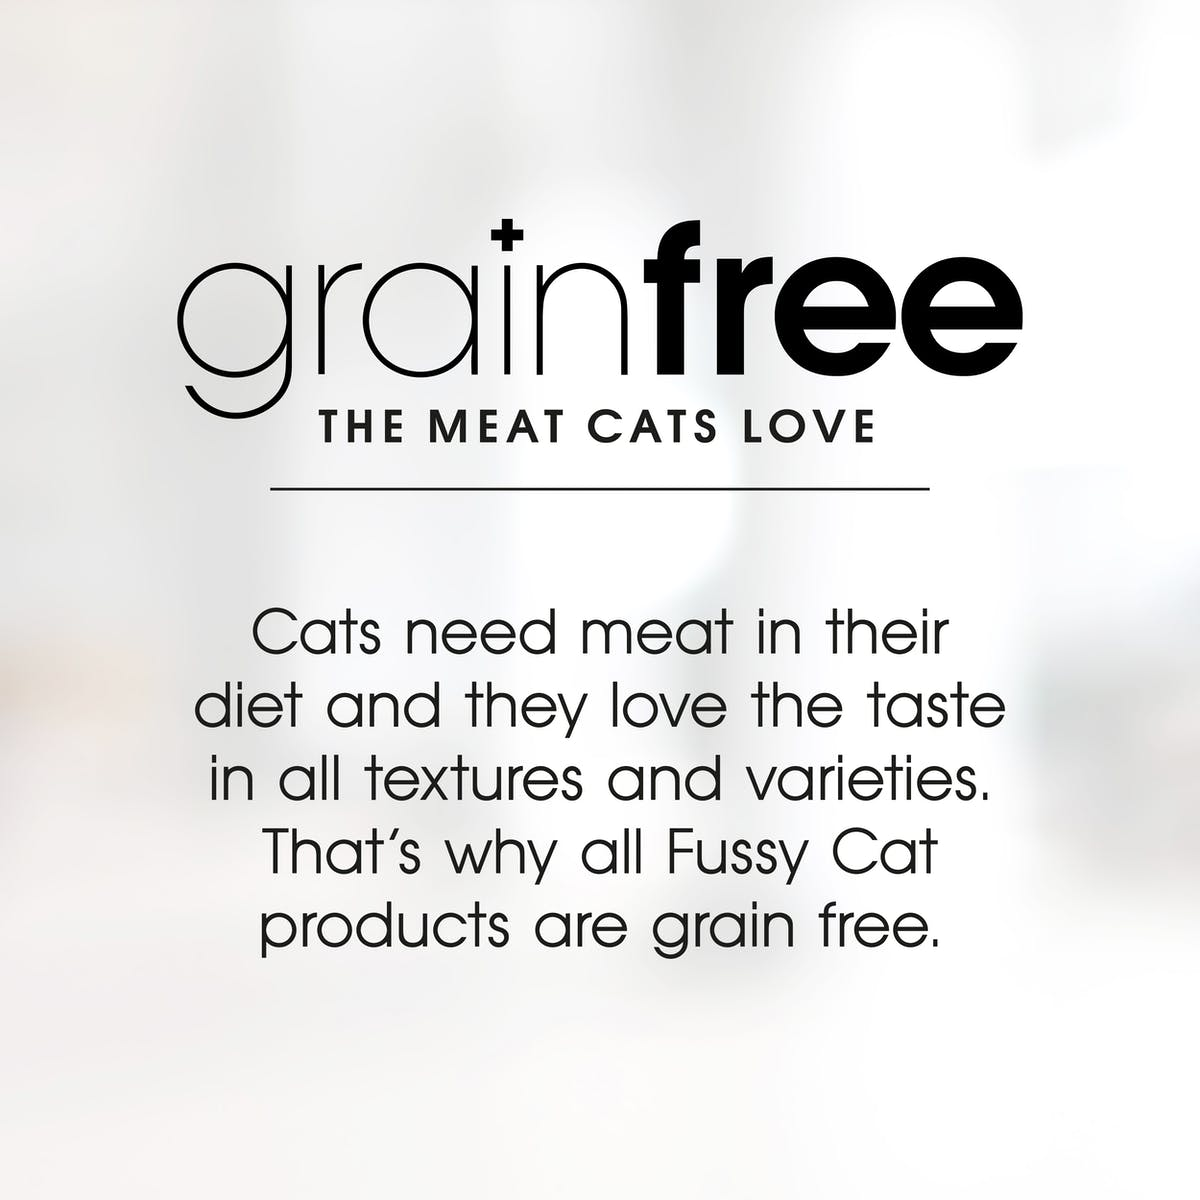 Fussy Cat | Prime Steak Mince 5 x 90g | Chilled cat food